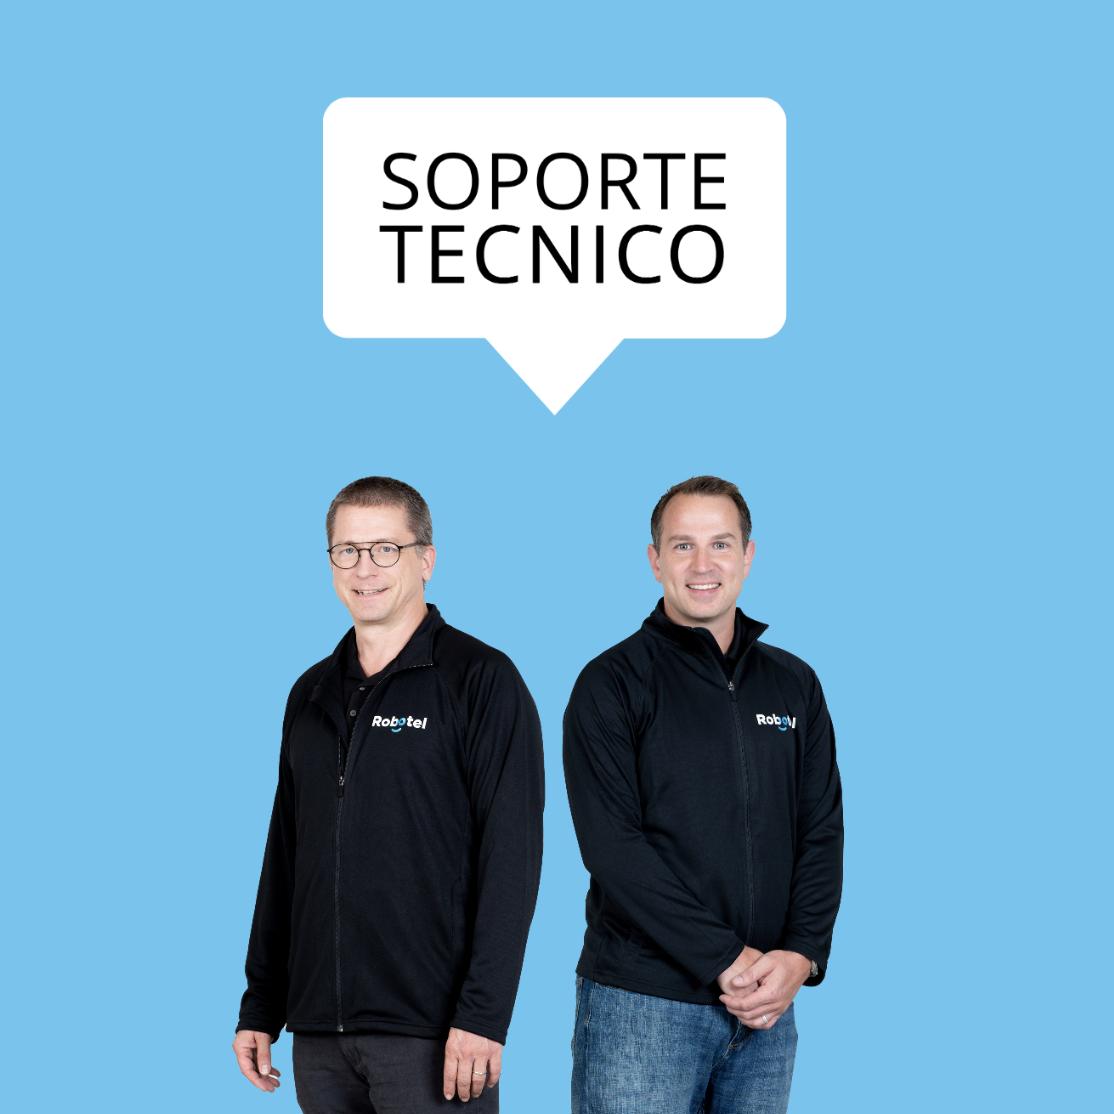 Soporte tecnico - Robotel